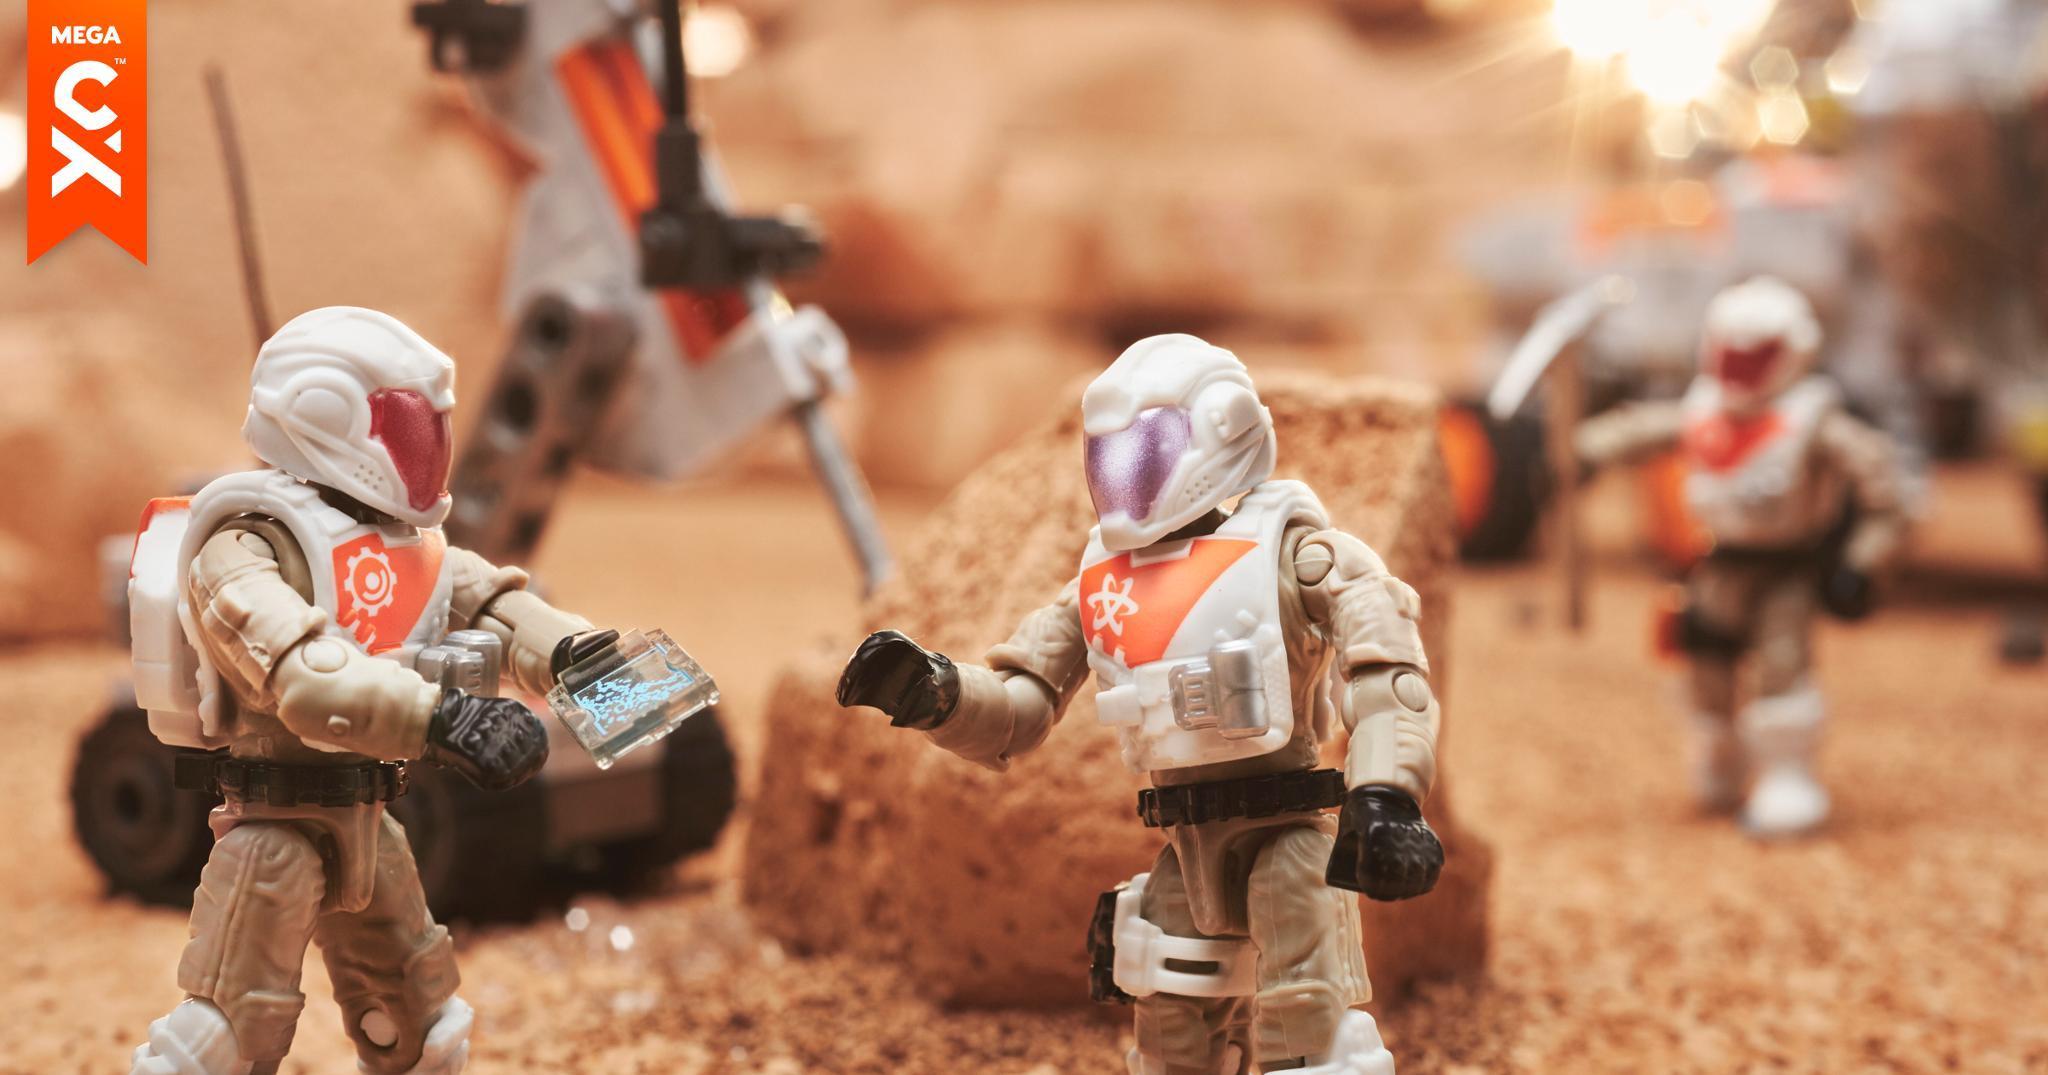 Mega Construx Probuilder Space Rover Expedition